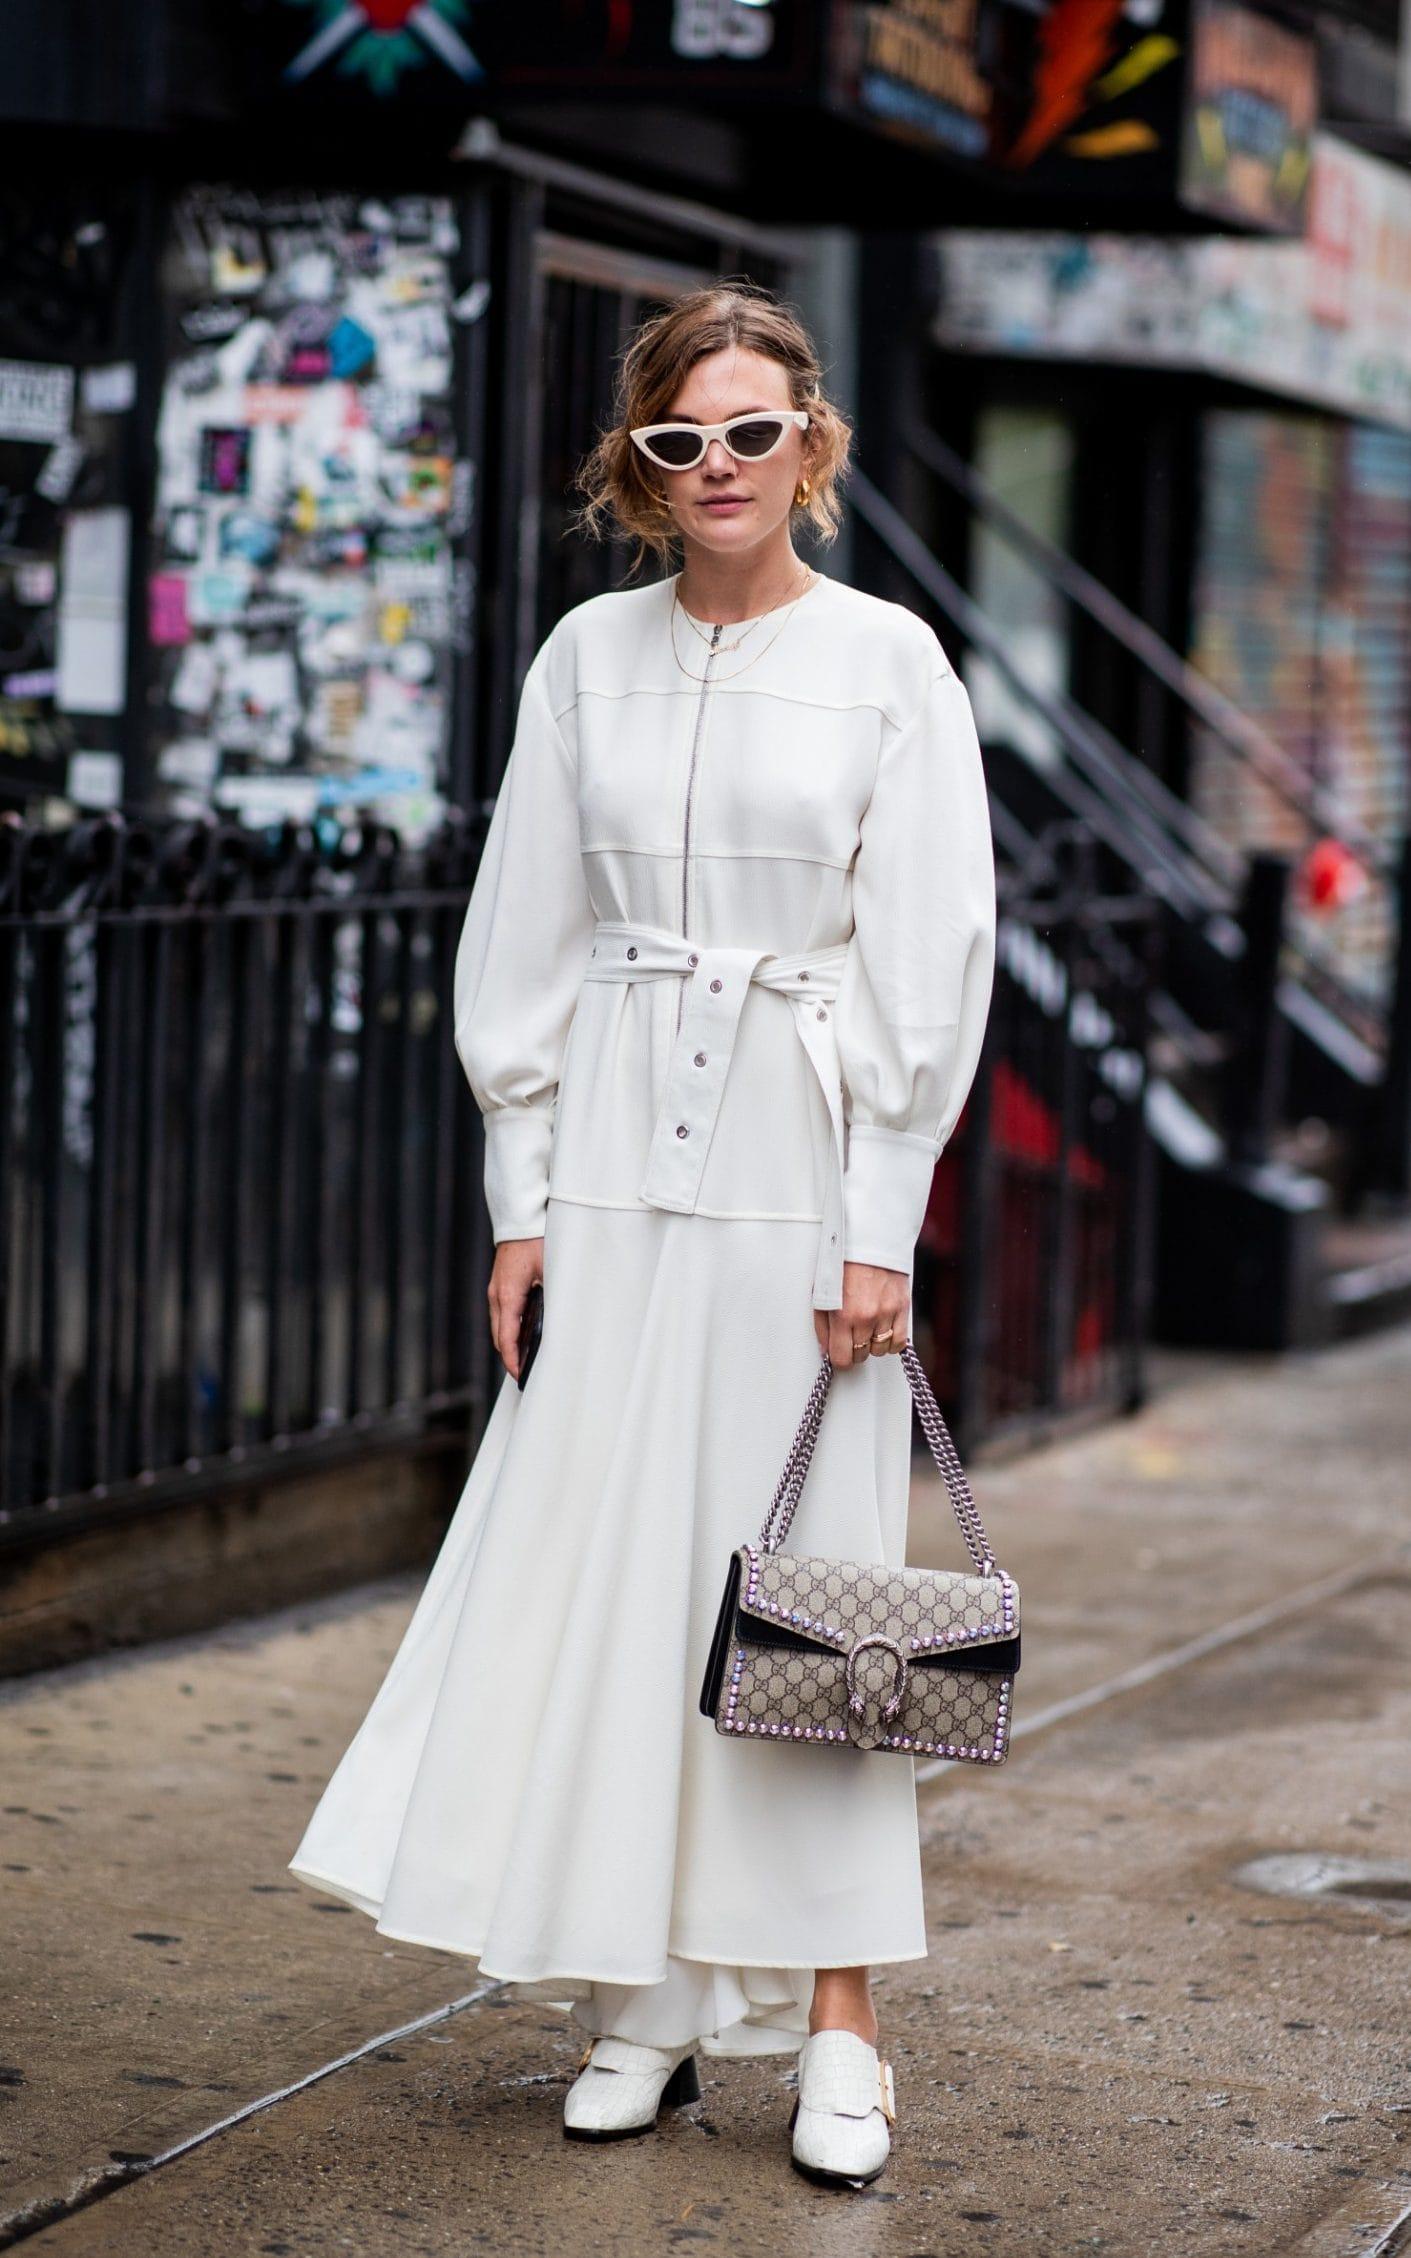 street style tuần lễ thời trang new york6